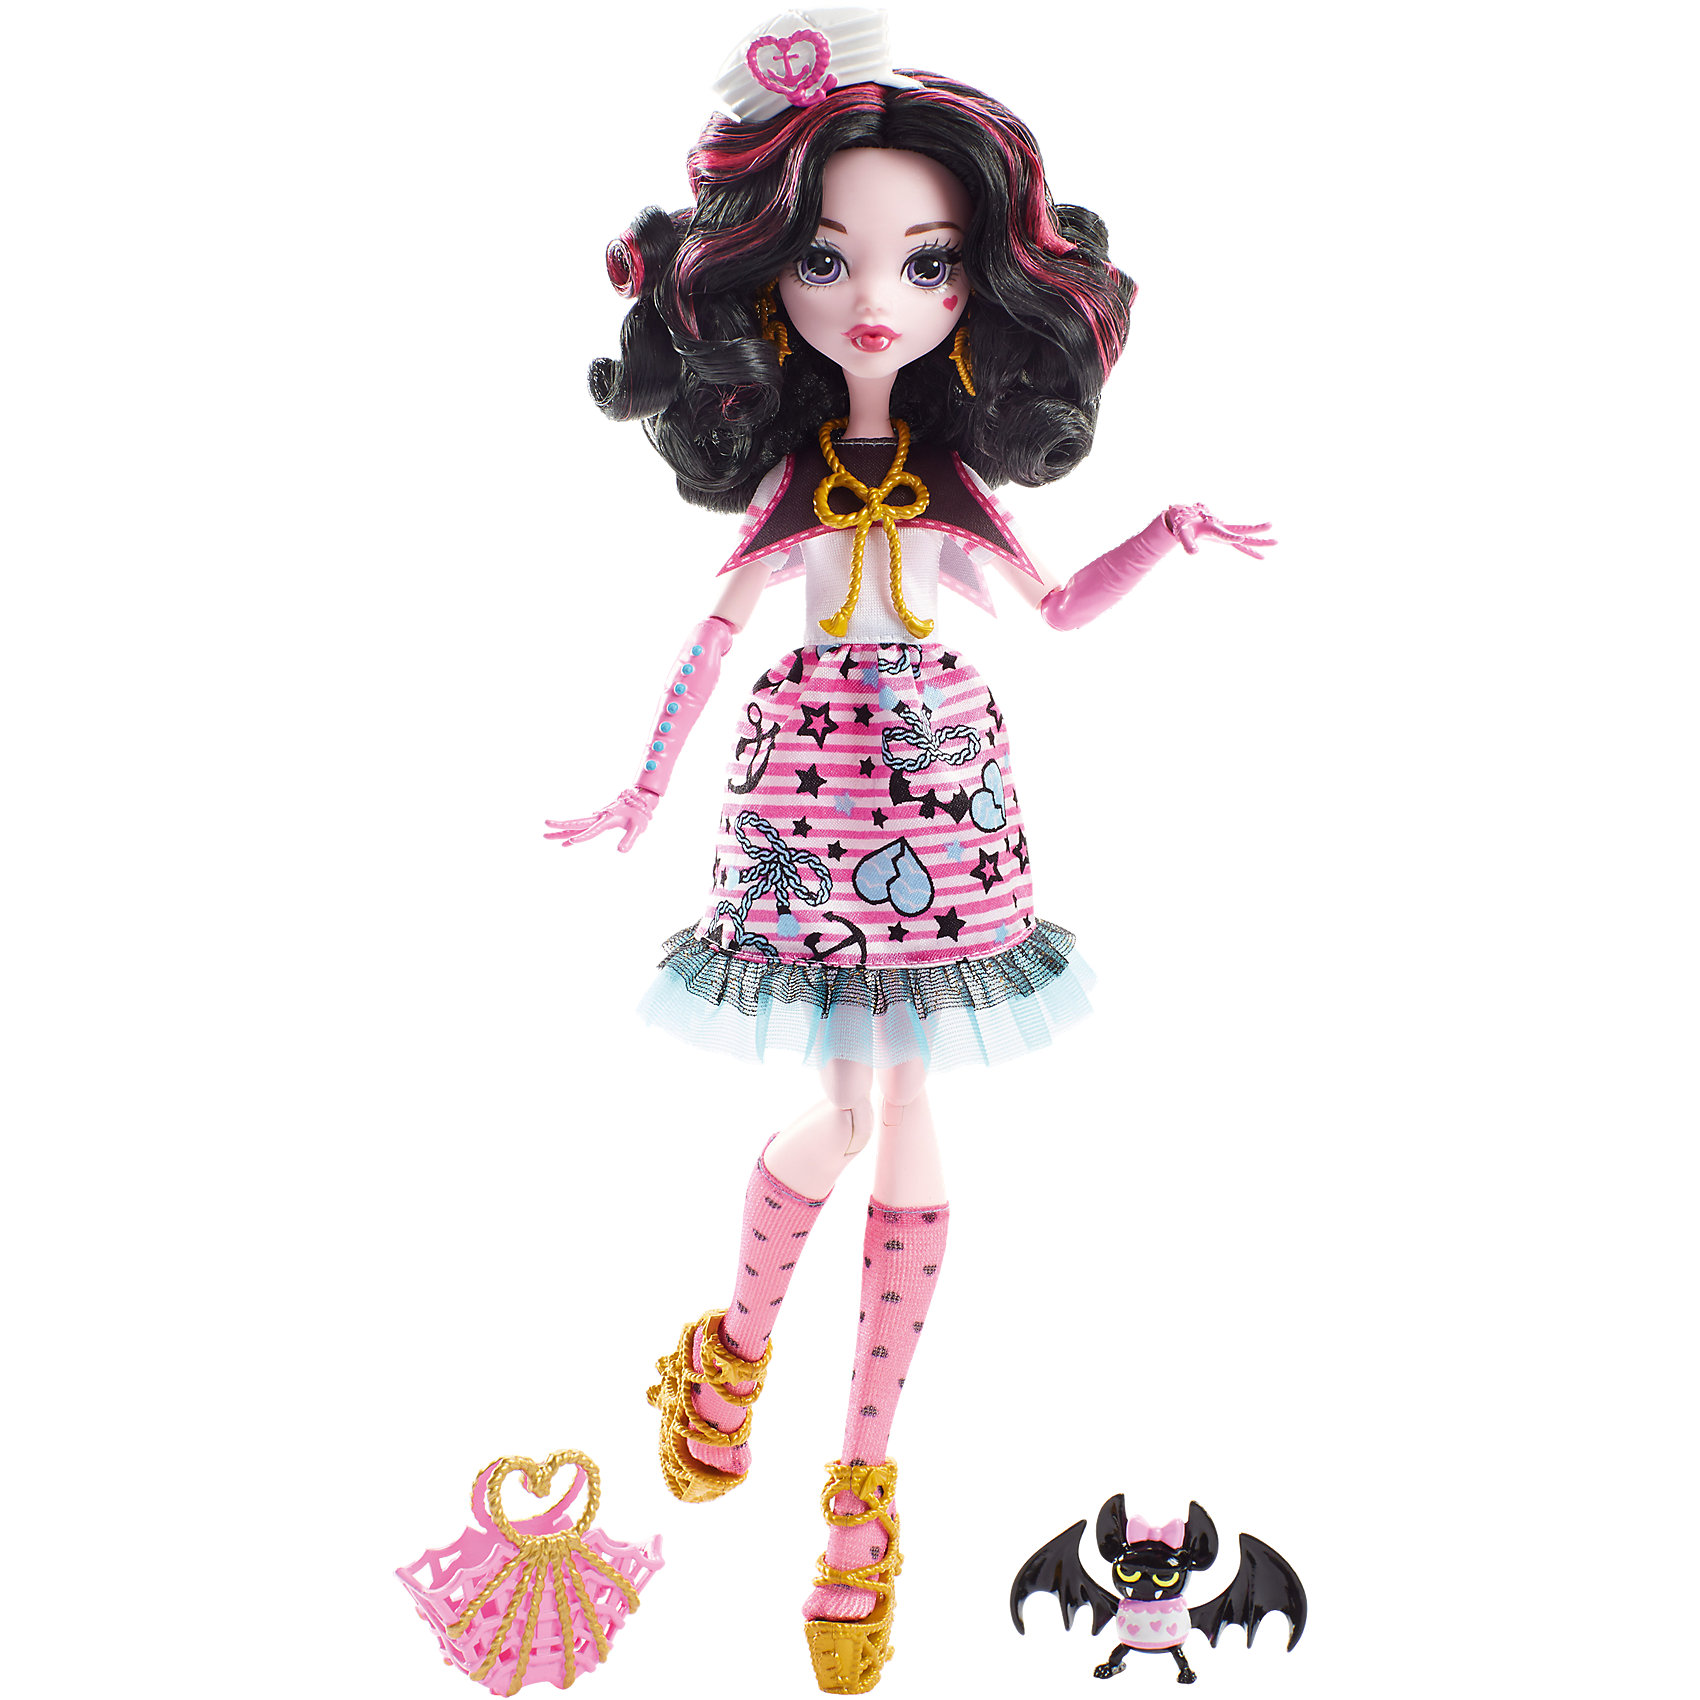 Mattel Кукла Дракулаура из серии Пиратская авантюра, Monster High куклы монстер хай дракулаура базовая